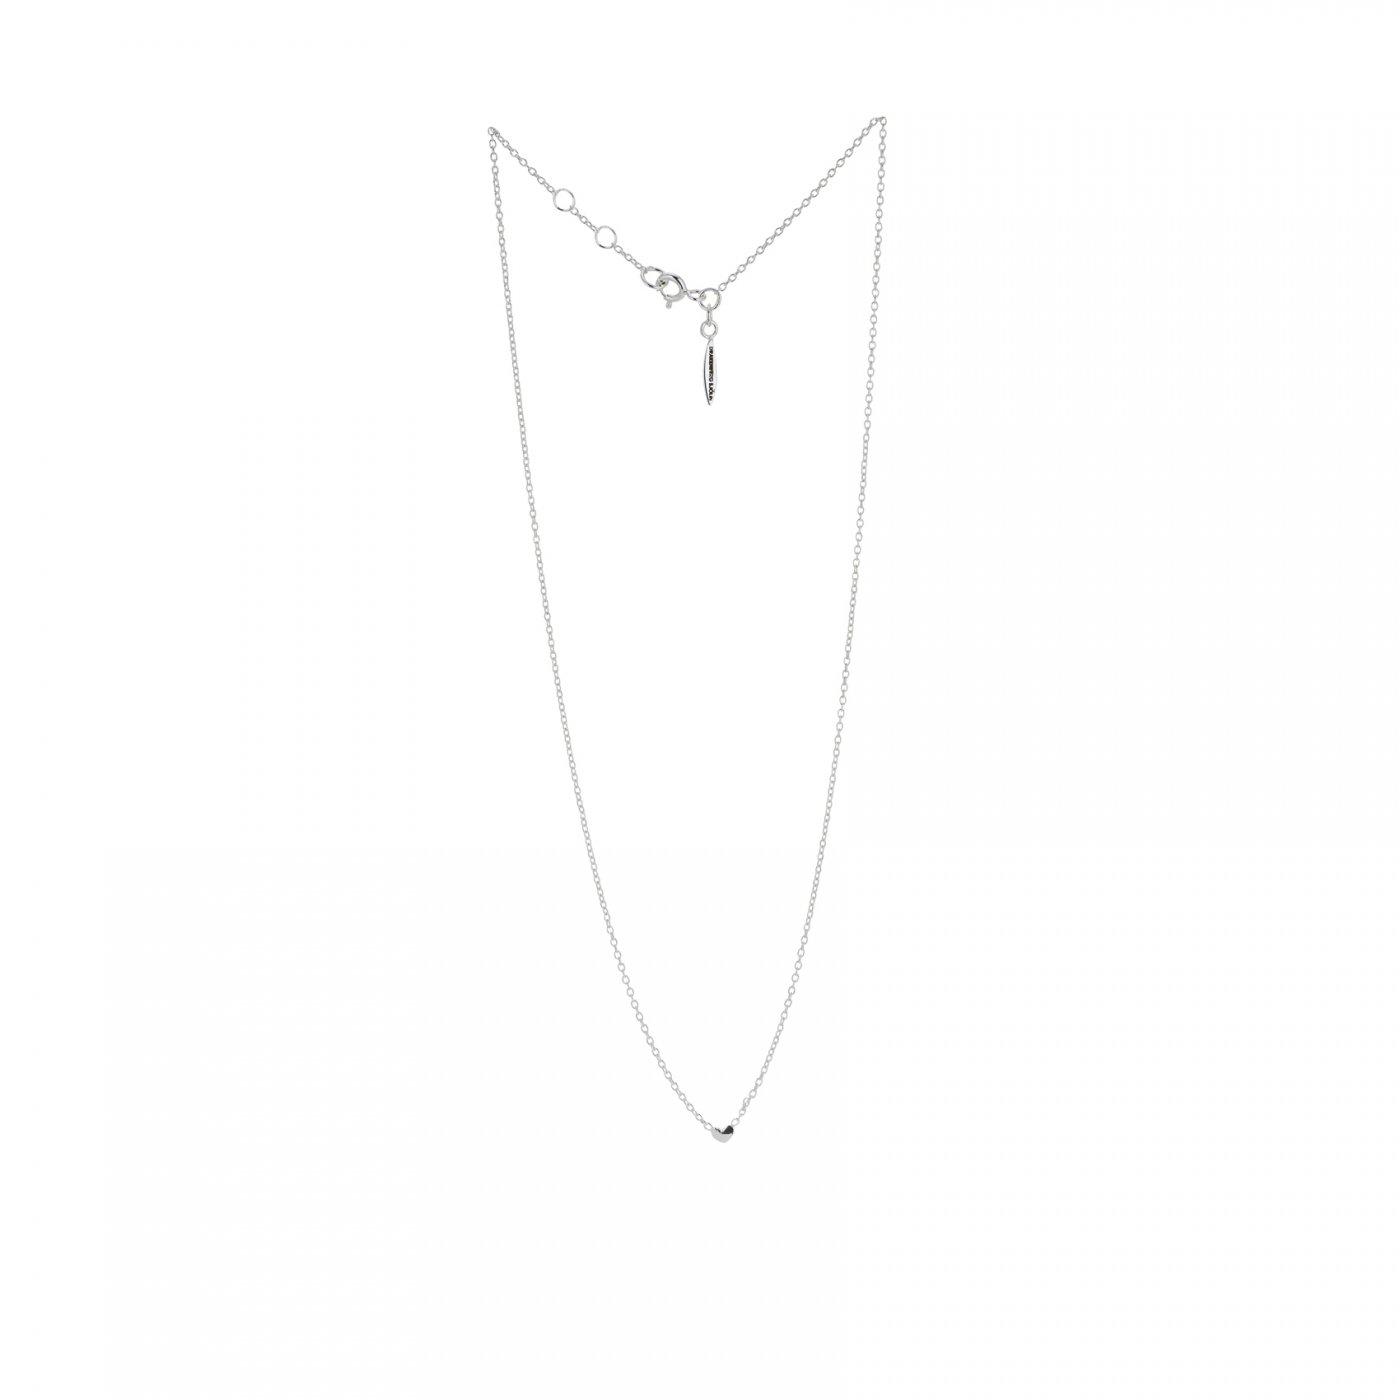 Loving-Heart-drop-necklace-1-1400x1400